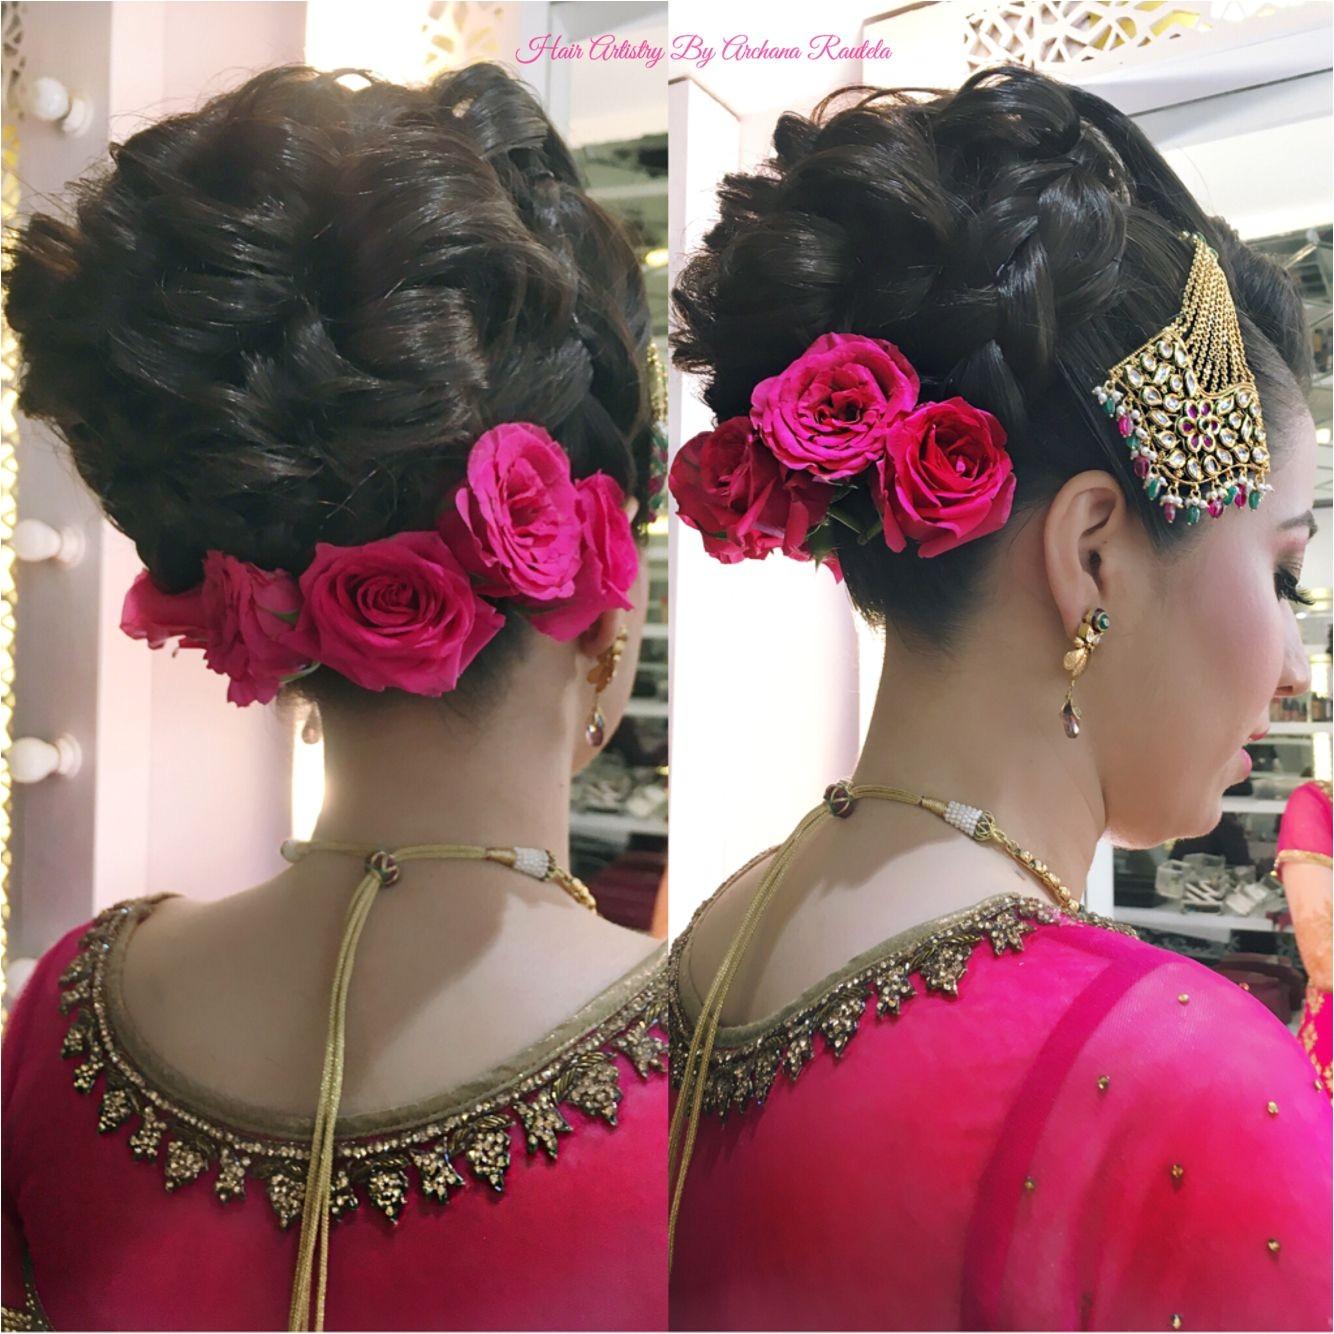 I love bridal buns Pink theme❤ ❤ ❤ ❤ Hair Artistry